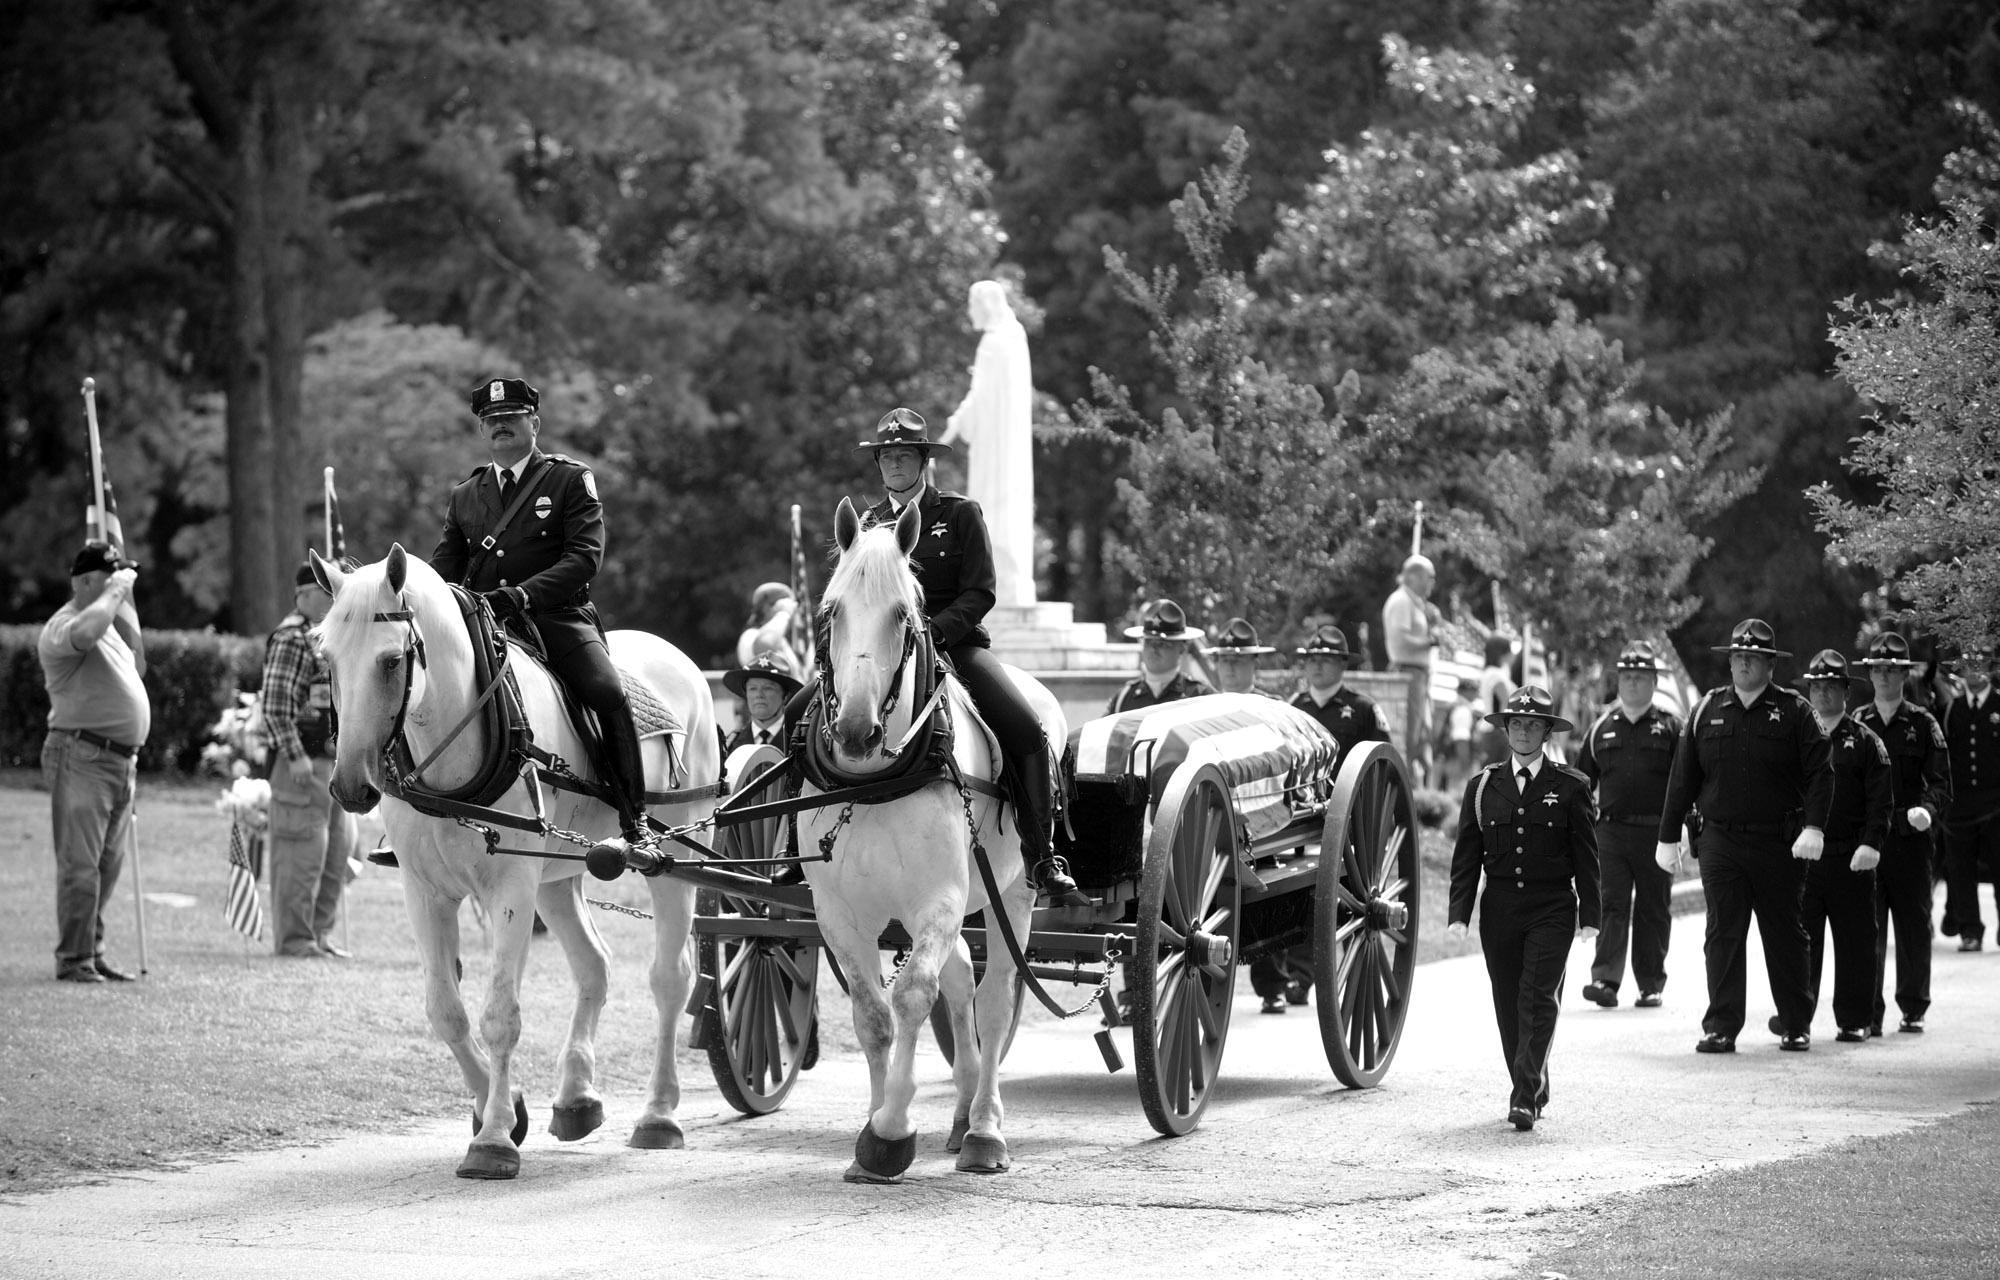 BW_DeputyKilled_Funeral 57.jpg